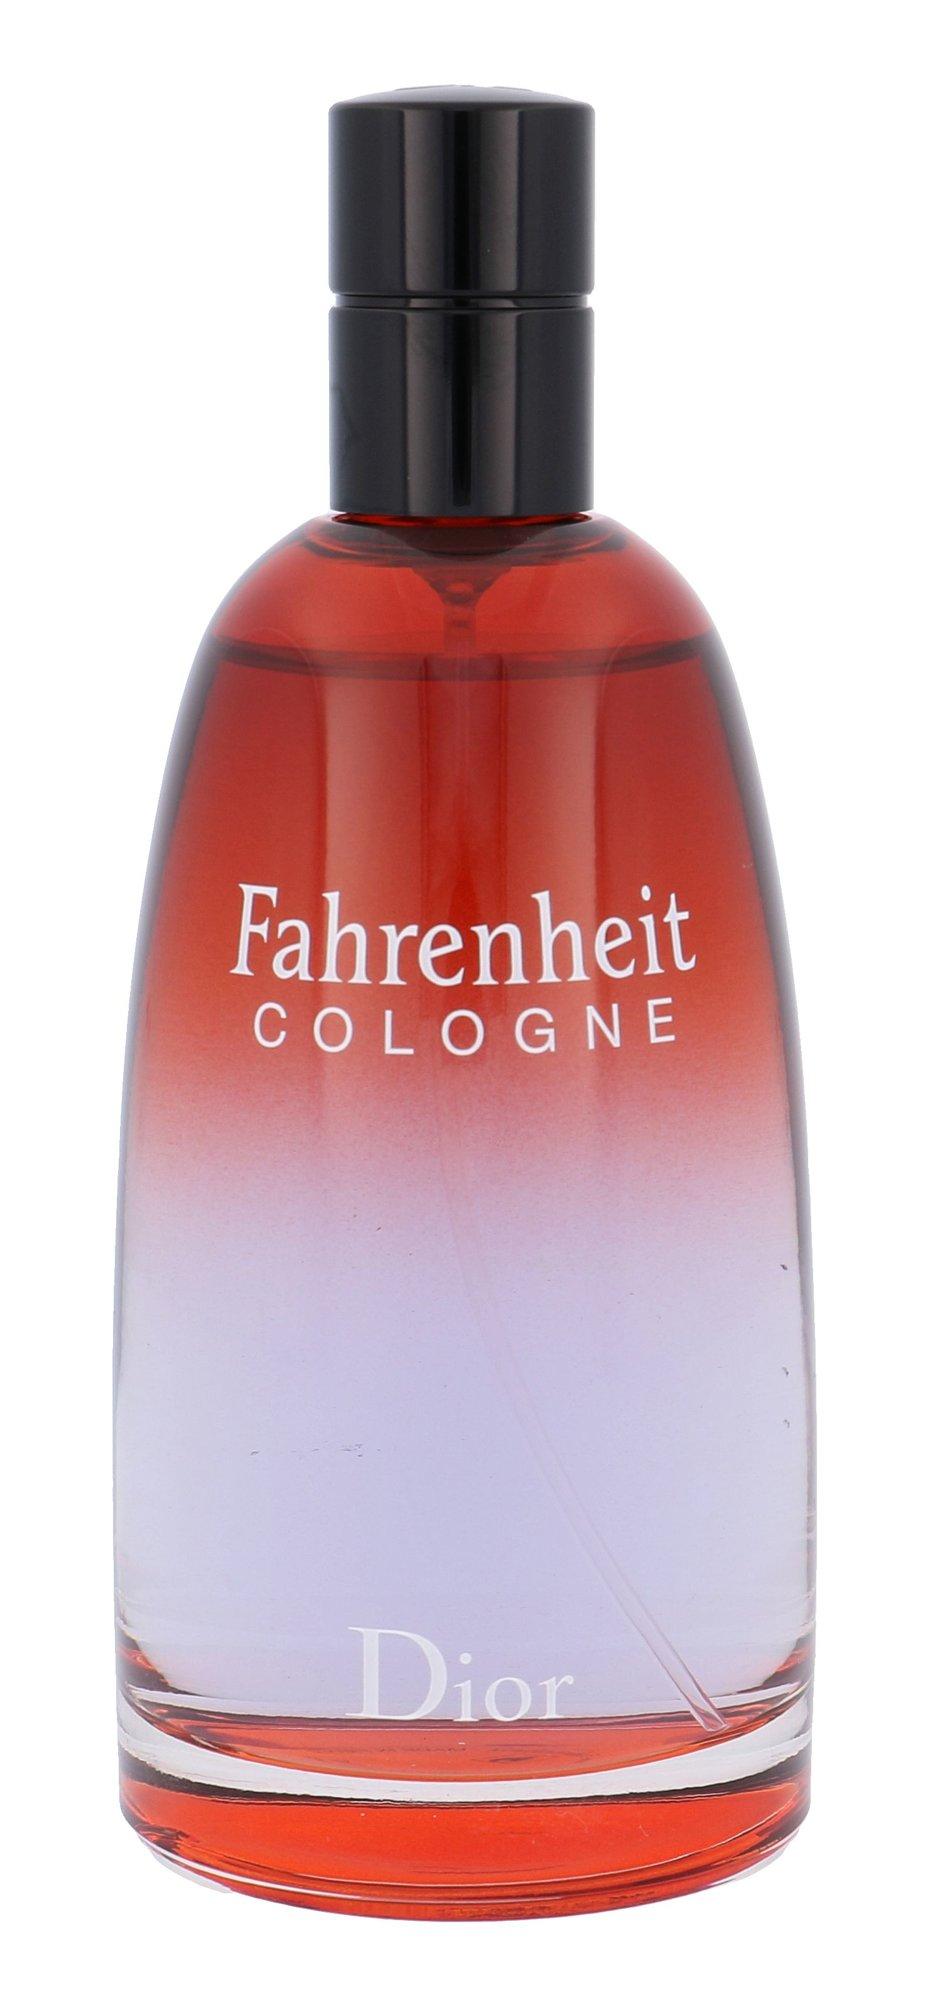 Christian Dior Fahrenheit Cologne Cologne 125ml